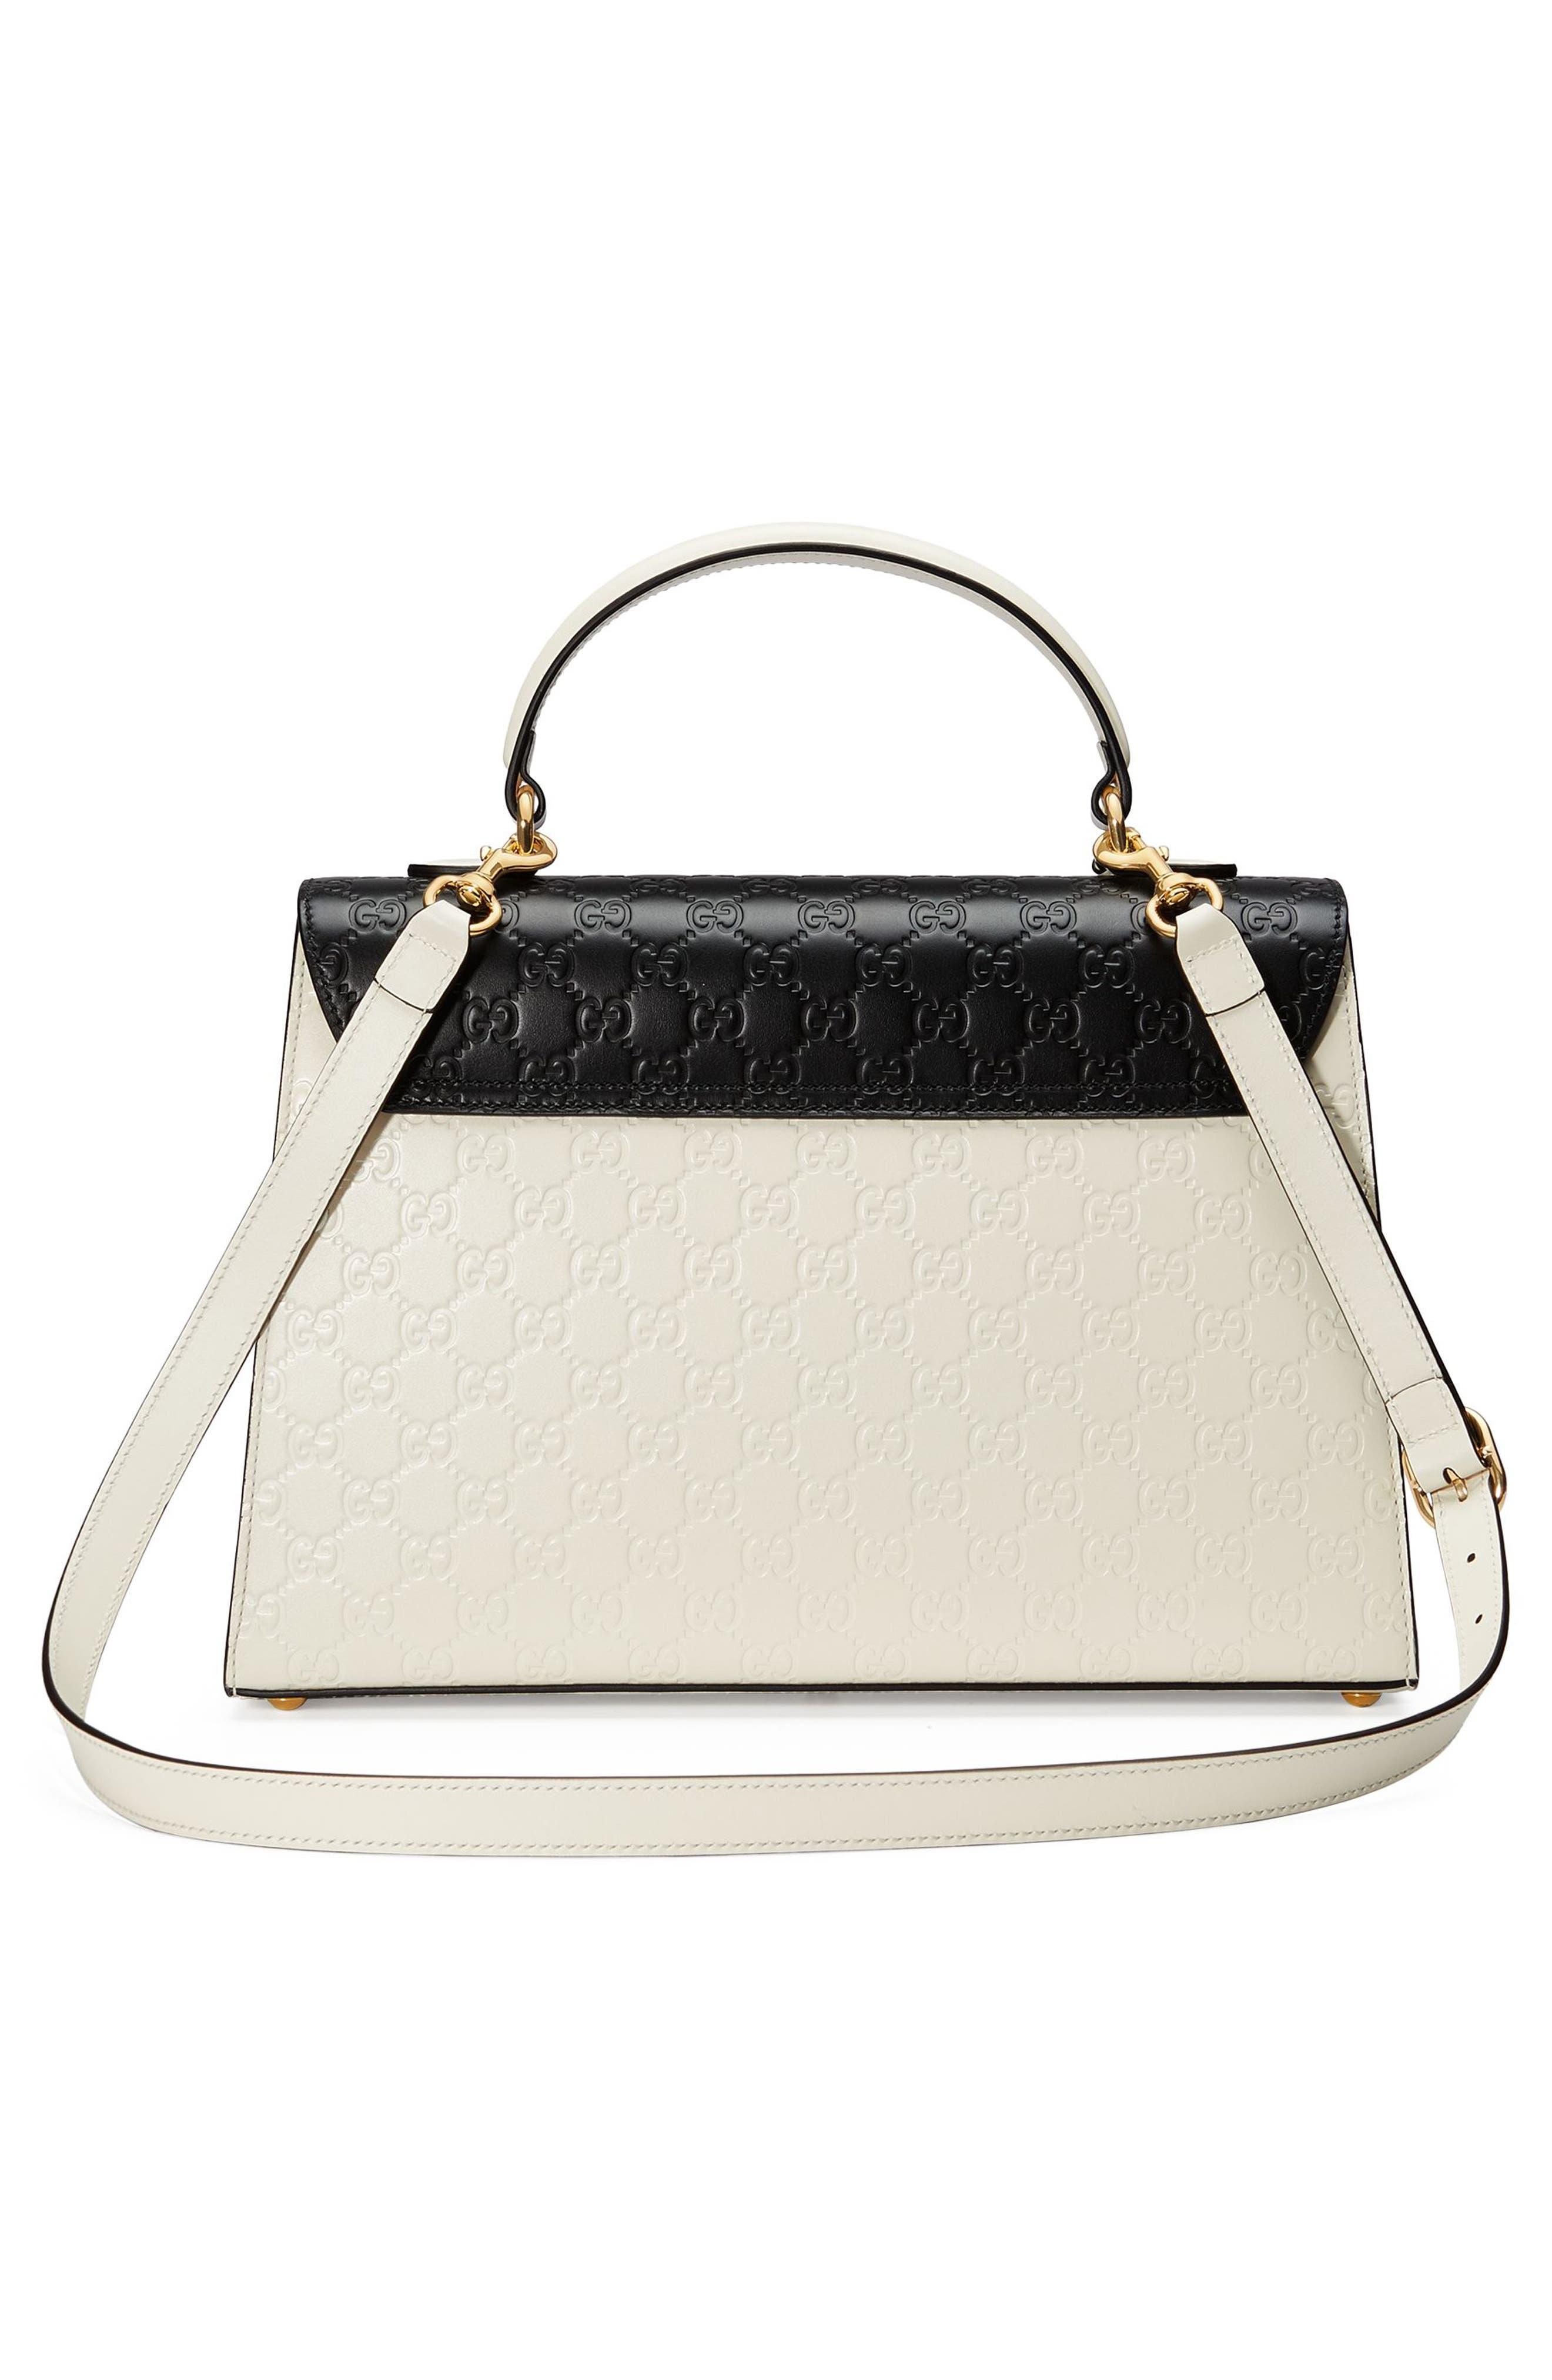 Alternate Image 2  - Gucci Medium Padlock Top Handles Signature Leather Satchel